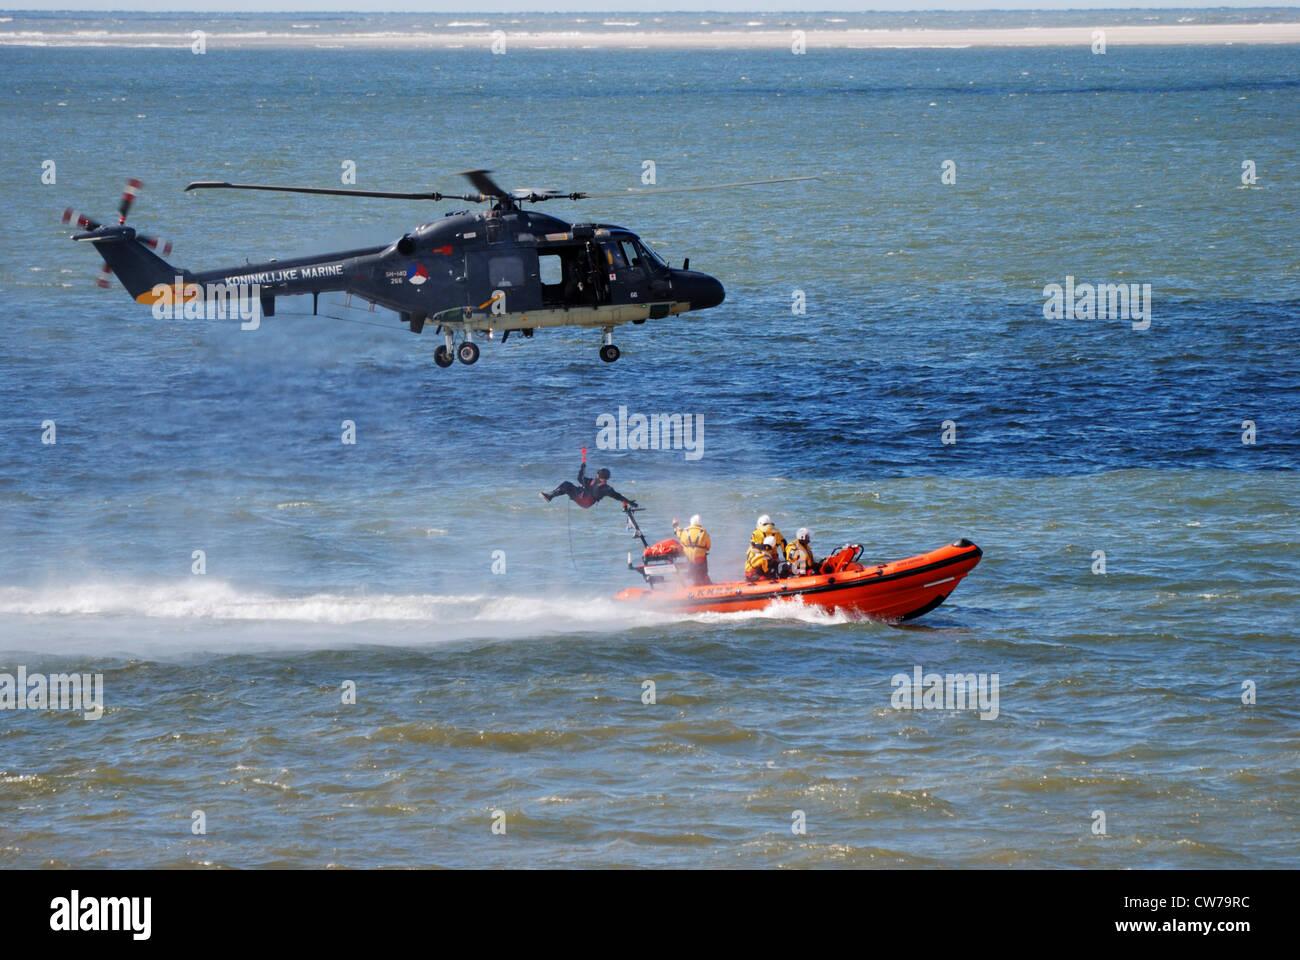 helicopter flying life-saver to speeding rubber boat, Netherlands, Den Helder - Stock Image